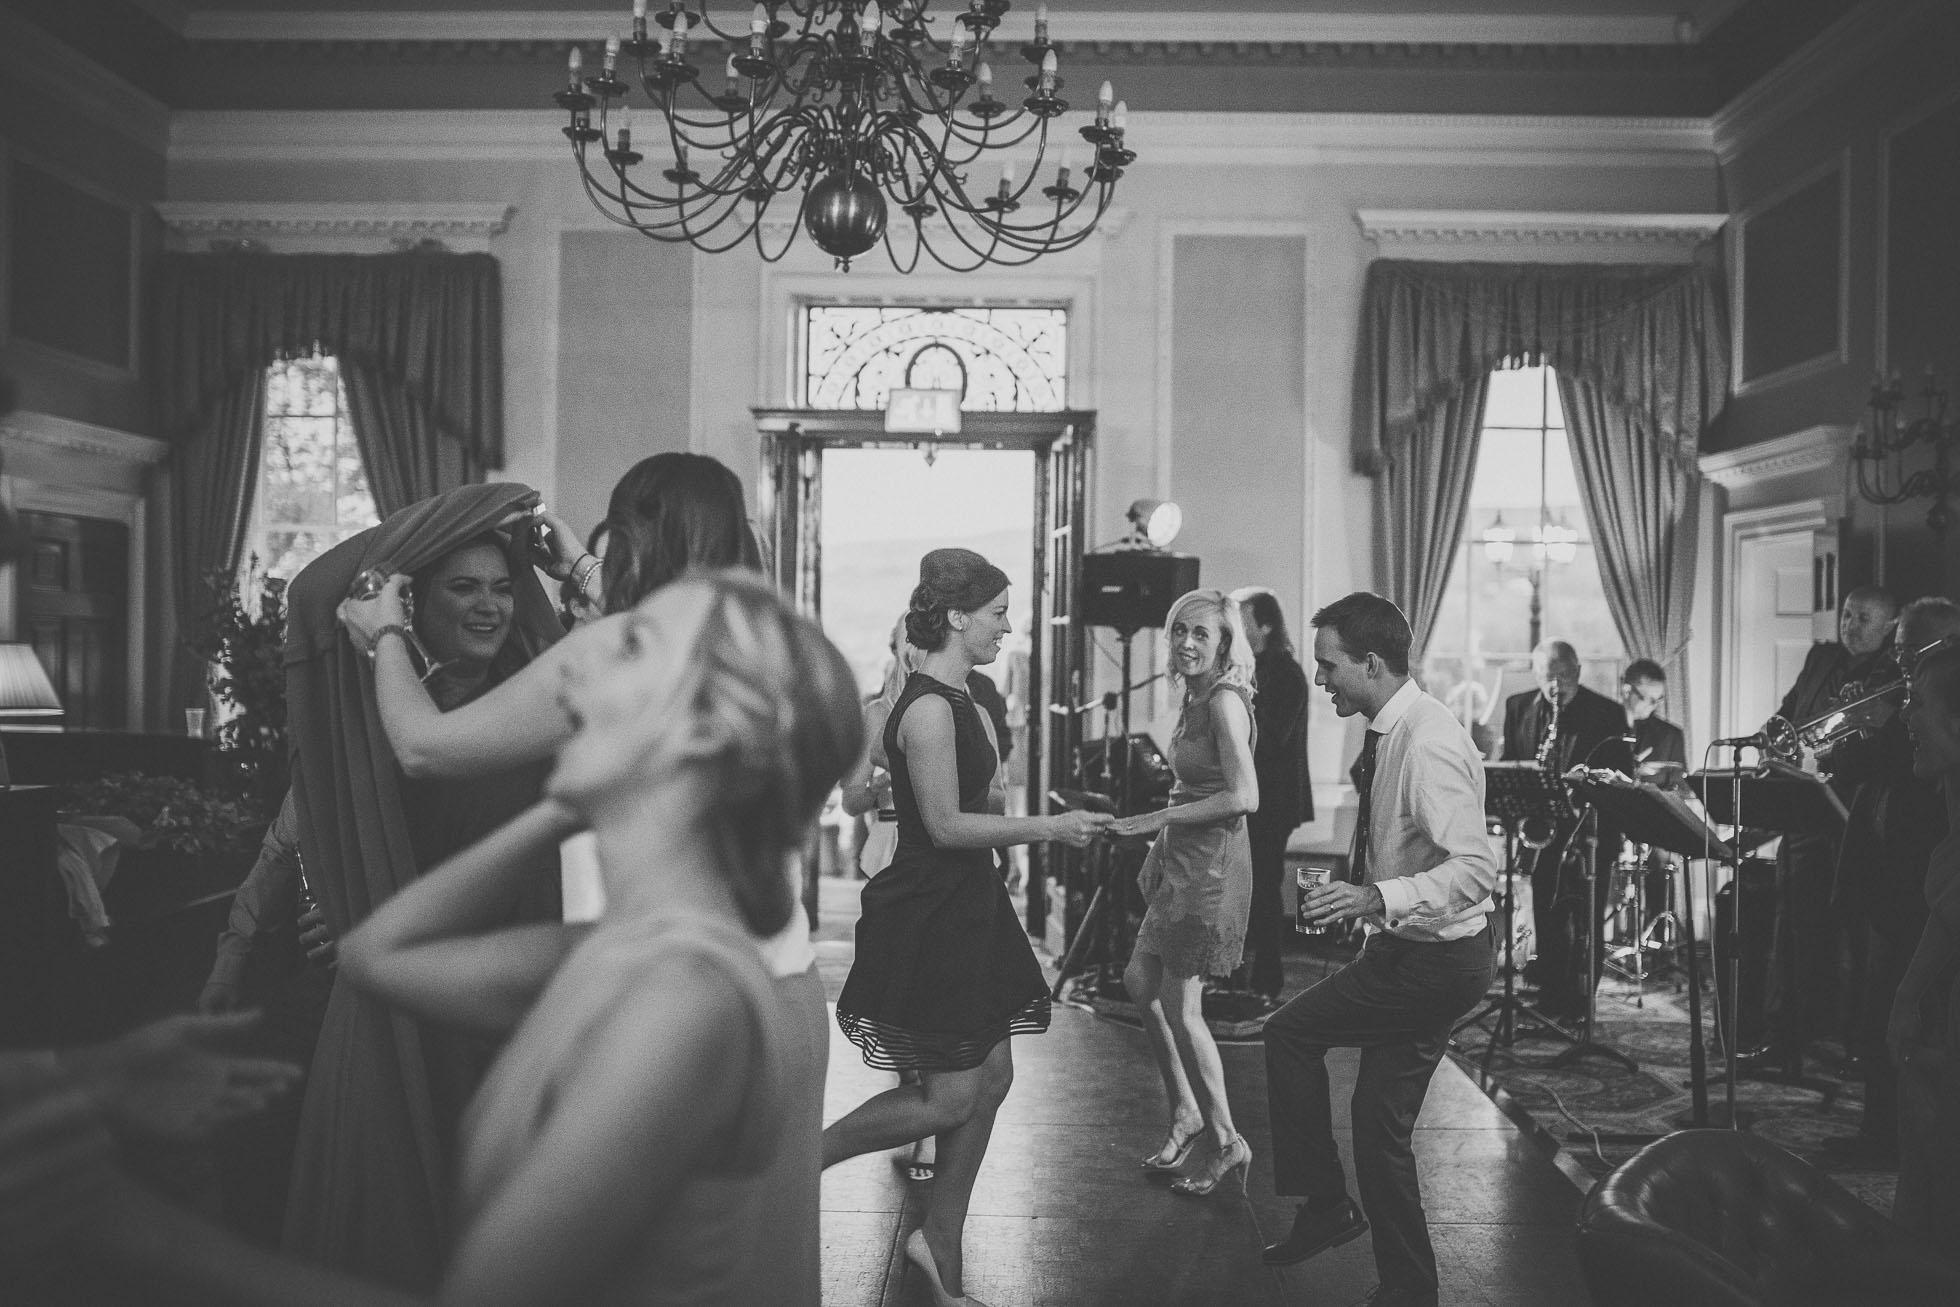 denton-hall-wedding-photographer-74.jpg